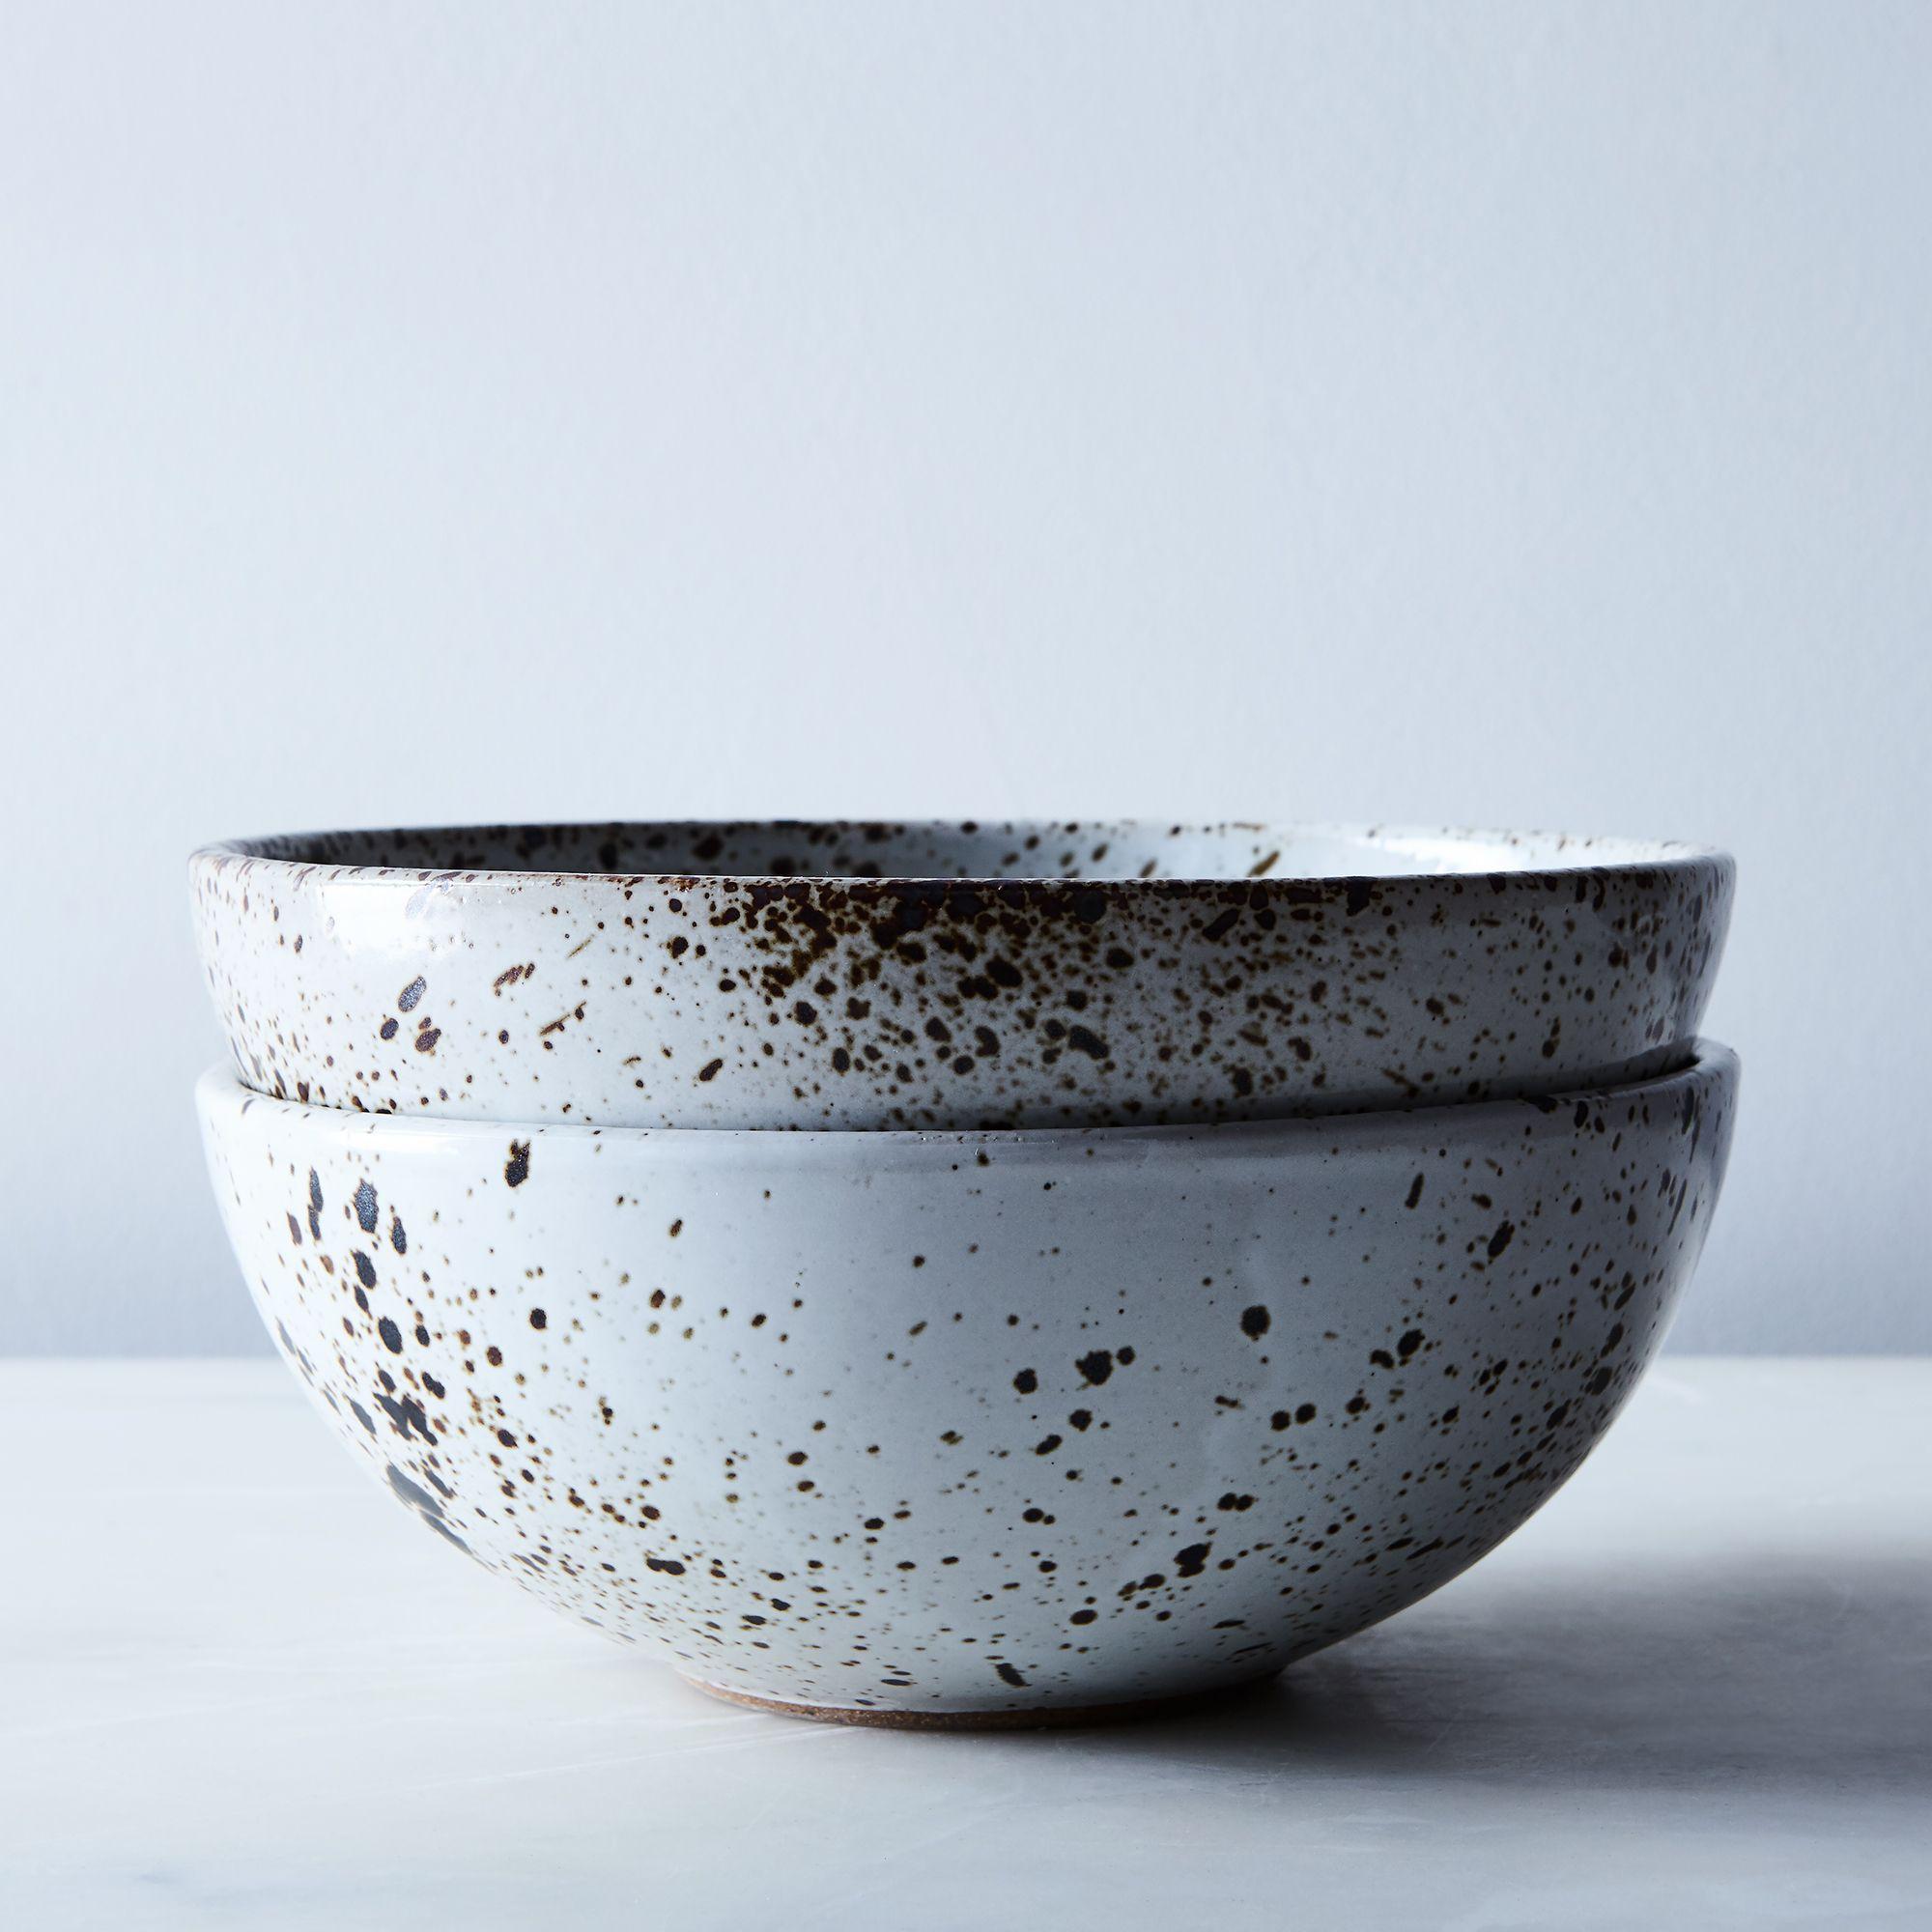 Sarah Kersten Handmade Ceramic Dinnerware (Set of 2) - Speckled, Ramen Bowl